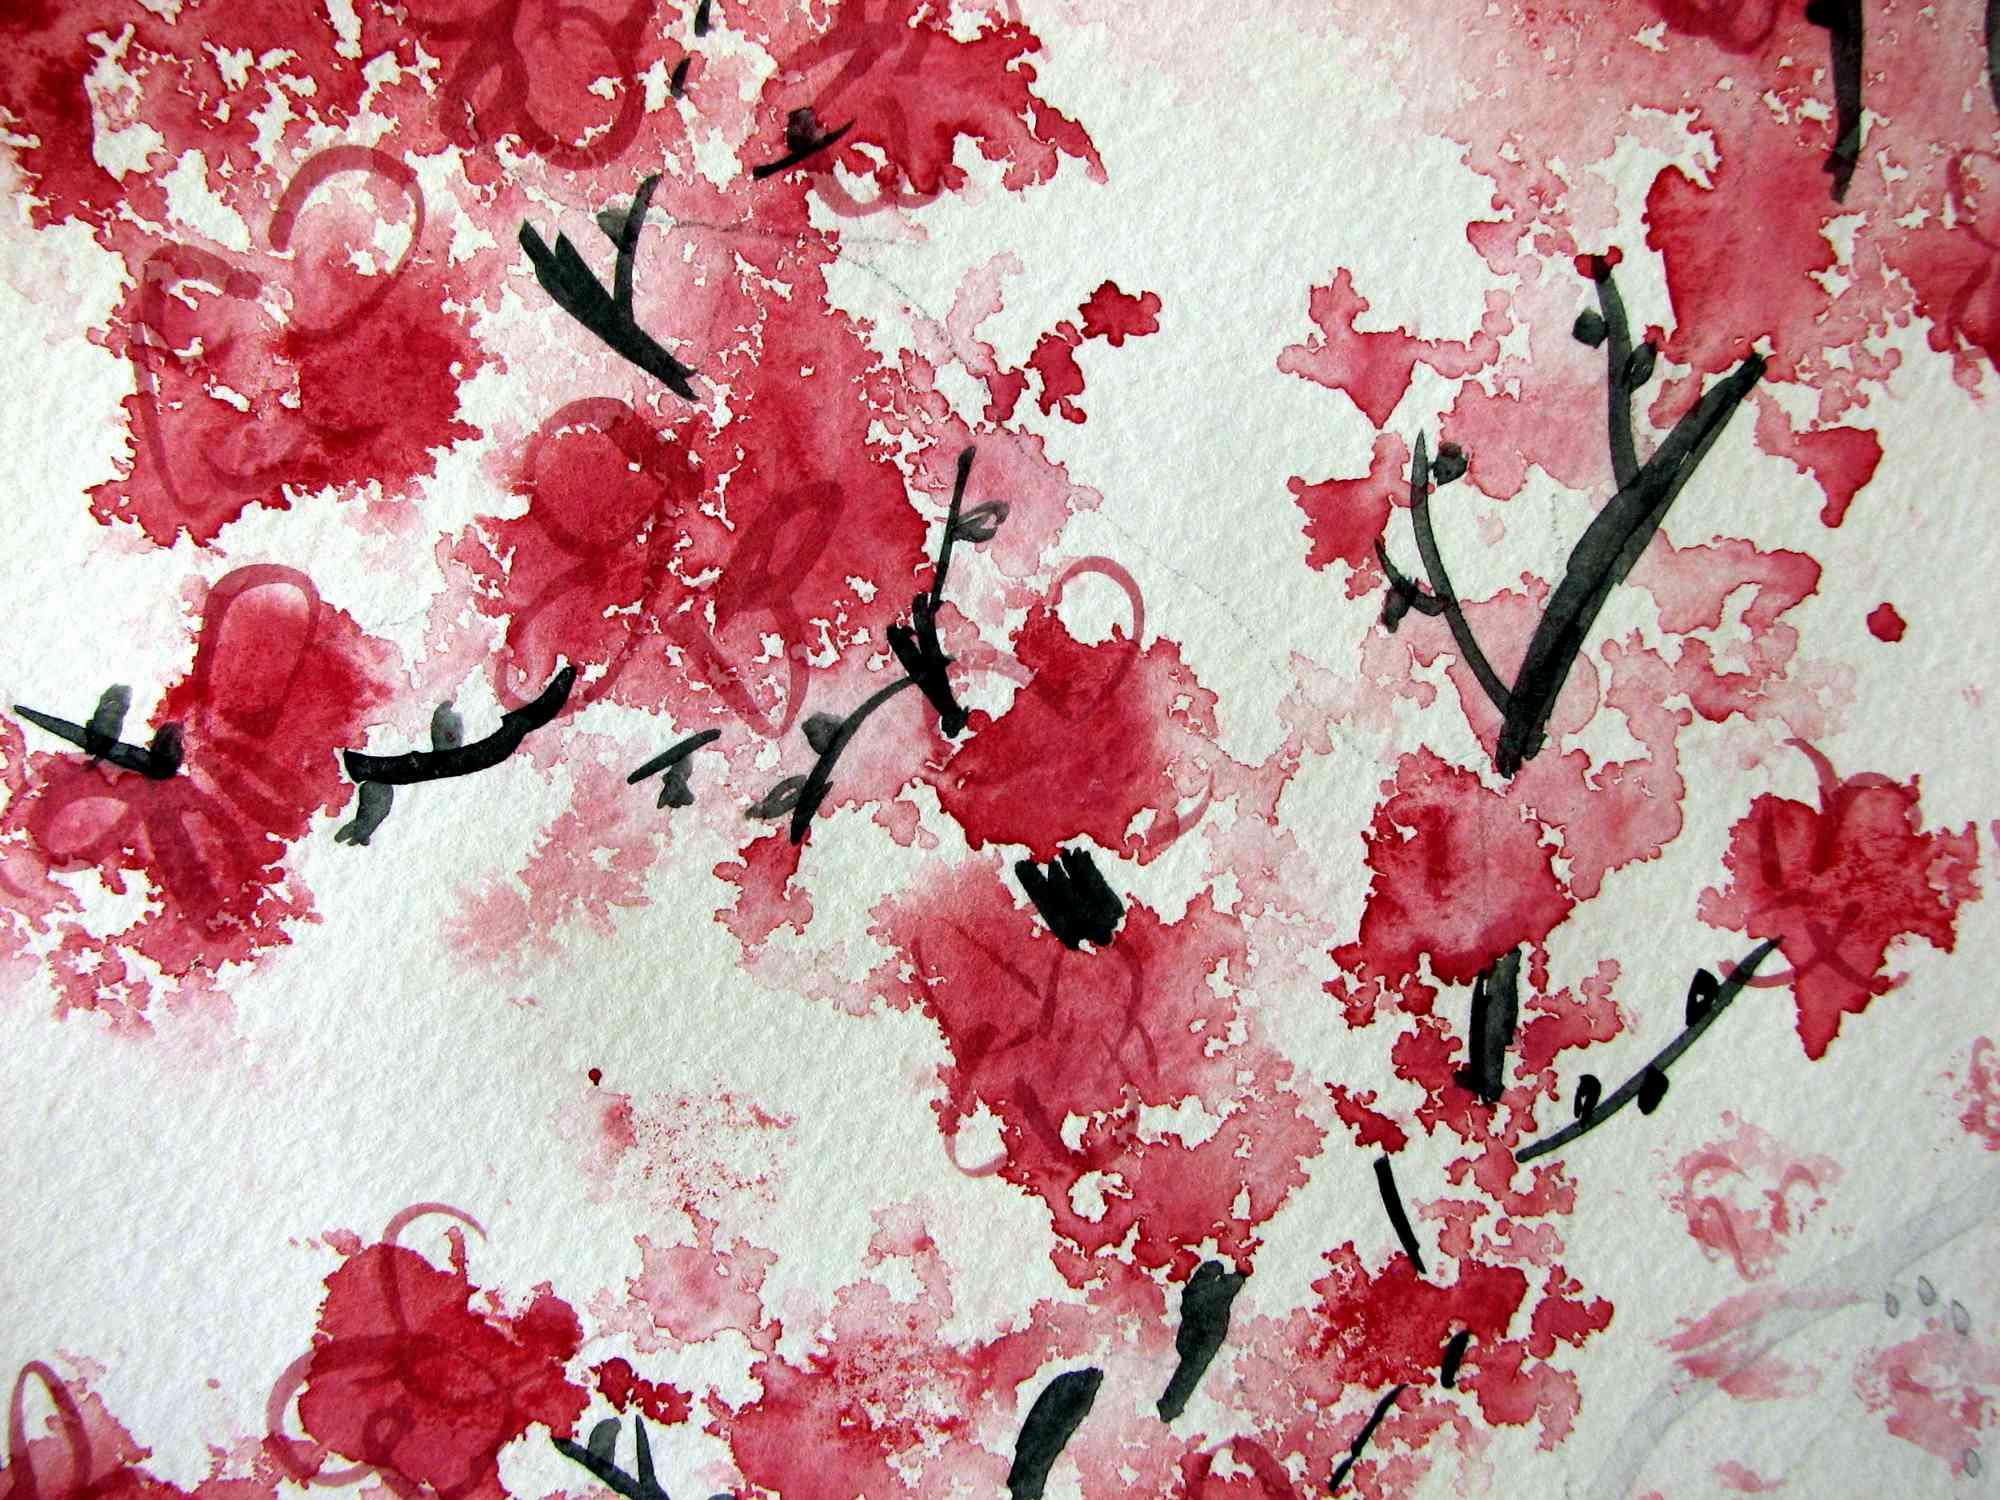 Cherry Blossom Art Wallpapers Top Free Cherry Blossom Art Backgrounds Wallpaperaccess